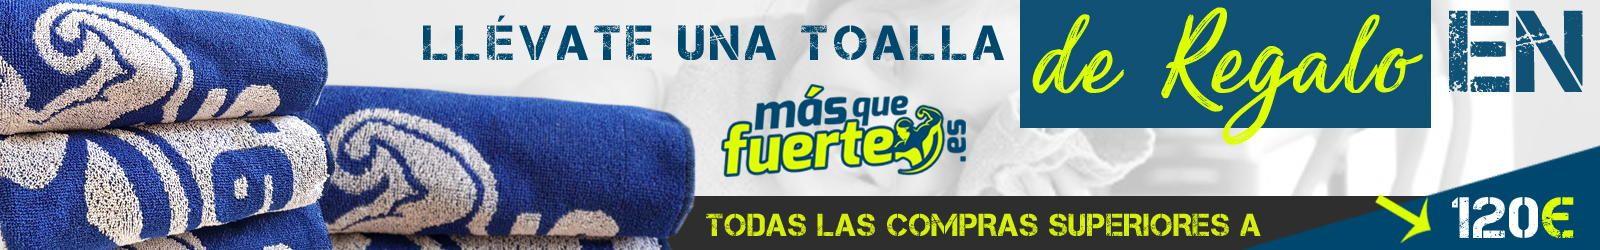 Toalla de REGALO - En tus pedidos superiores a 120€ una toalla valorada en 11,90€ GRATIS!